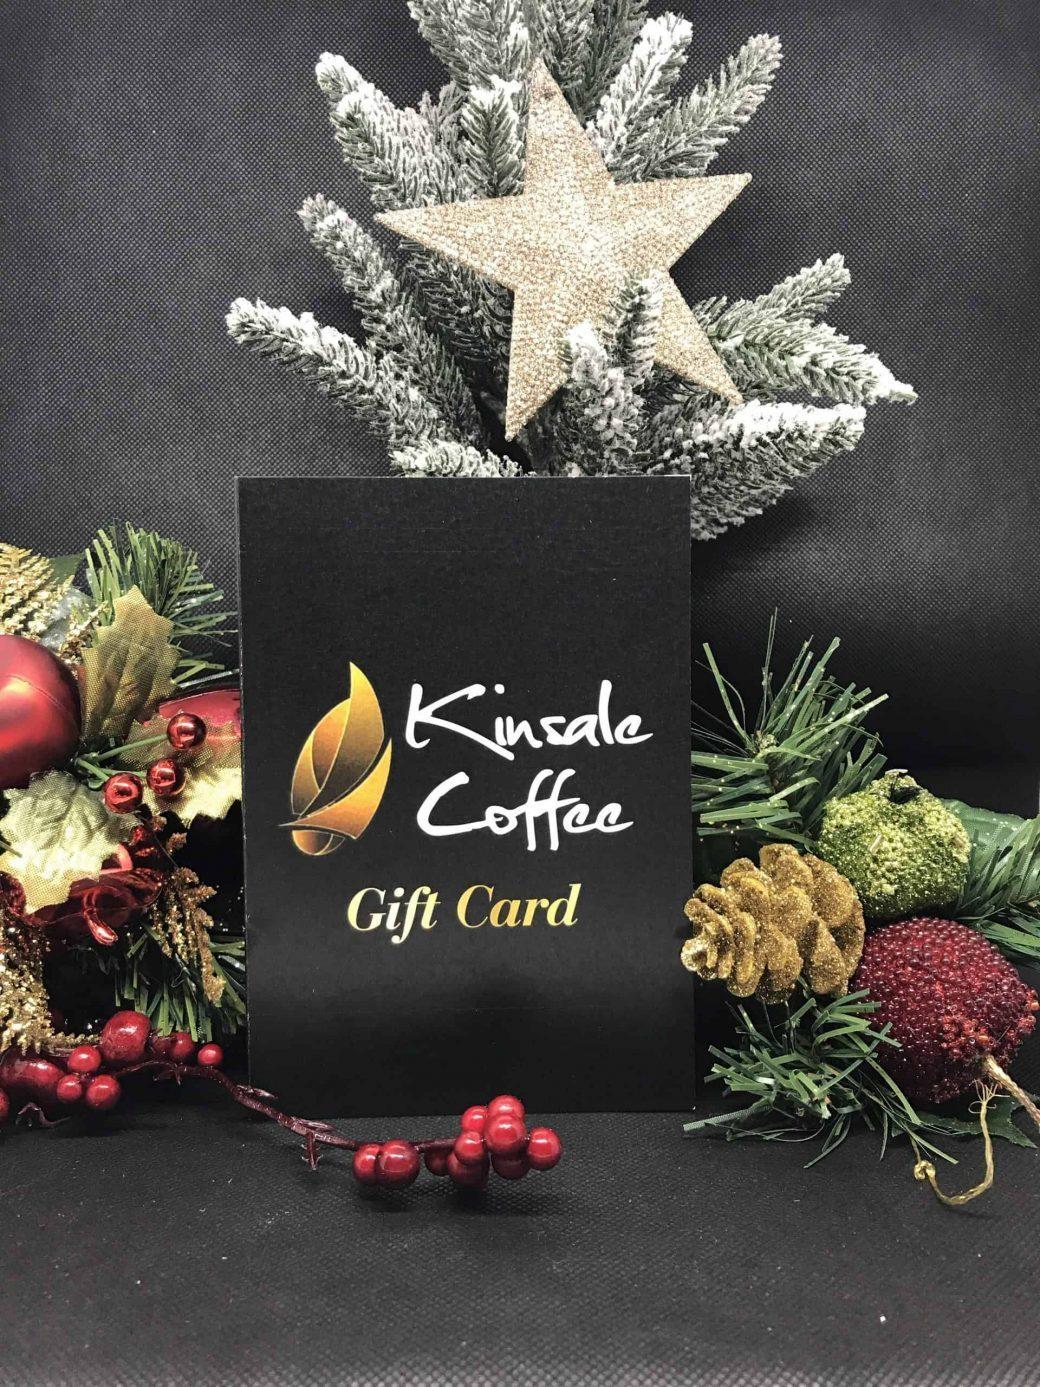 Kinsale Coffee Gift Card